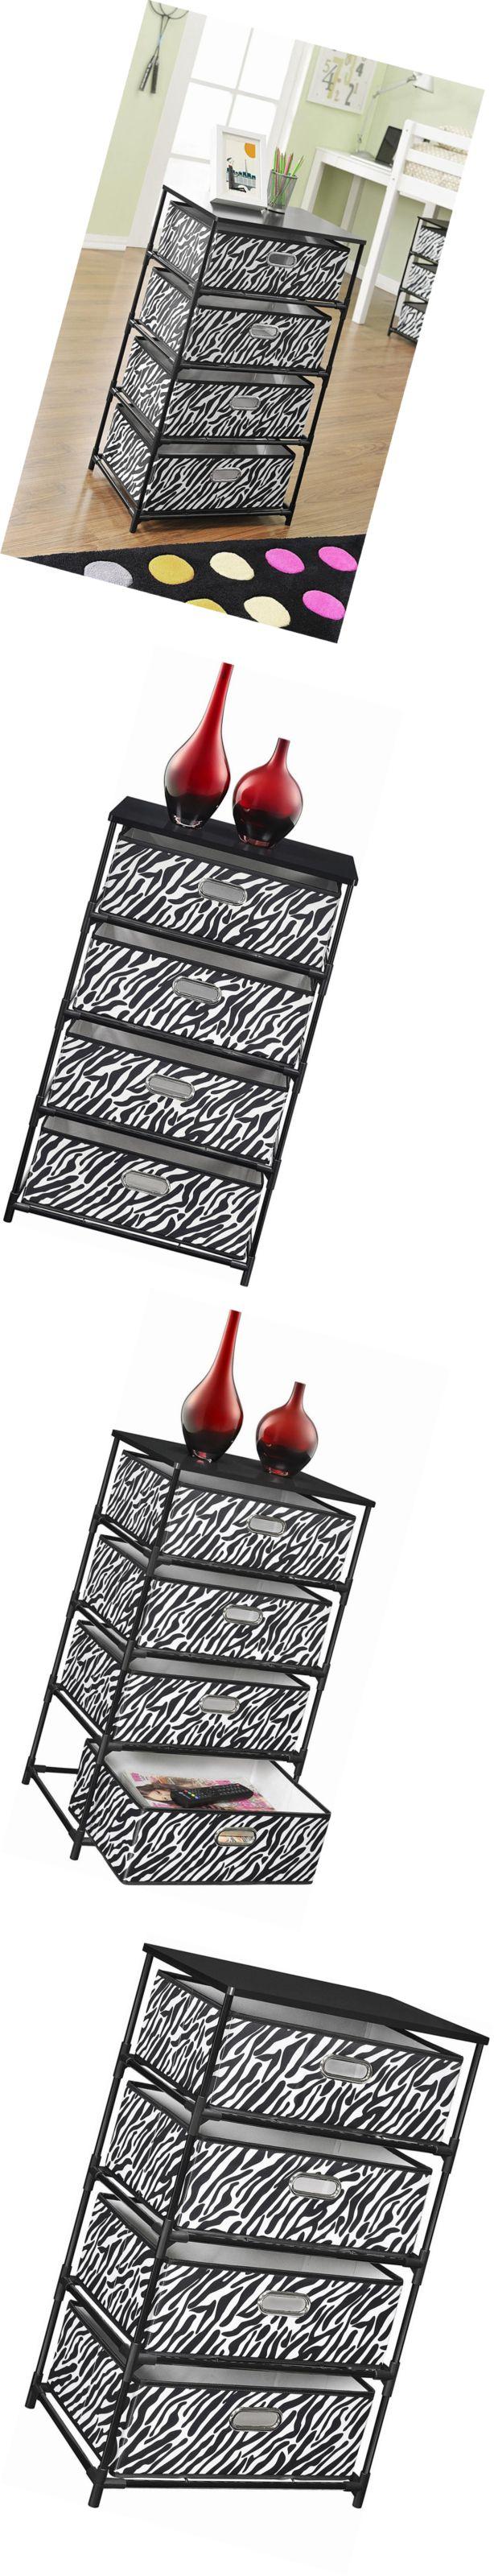 Storage Units 134651: Altra Sidney 4-Bin Storage End Table, Zebra Black -> BUY IT NOW ONLY: $42.74 on eBay!